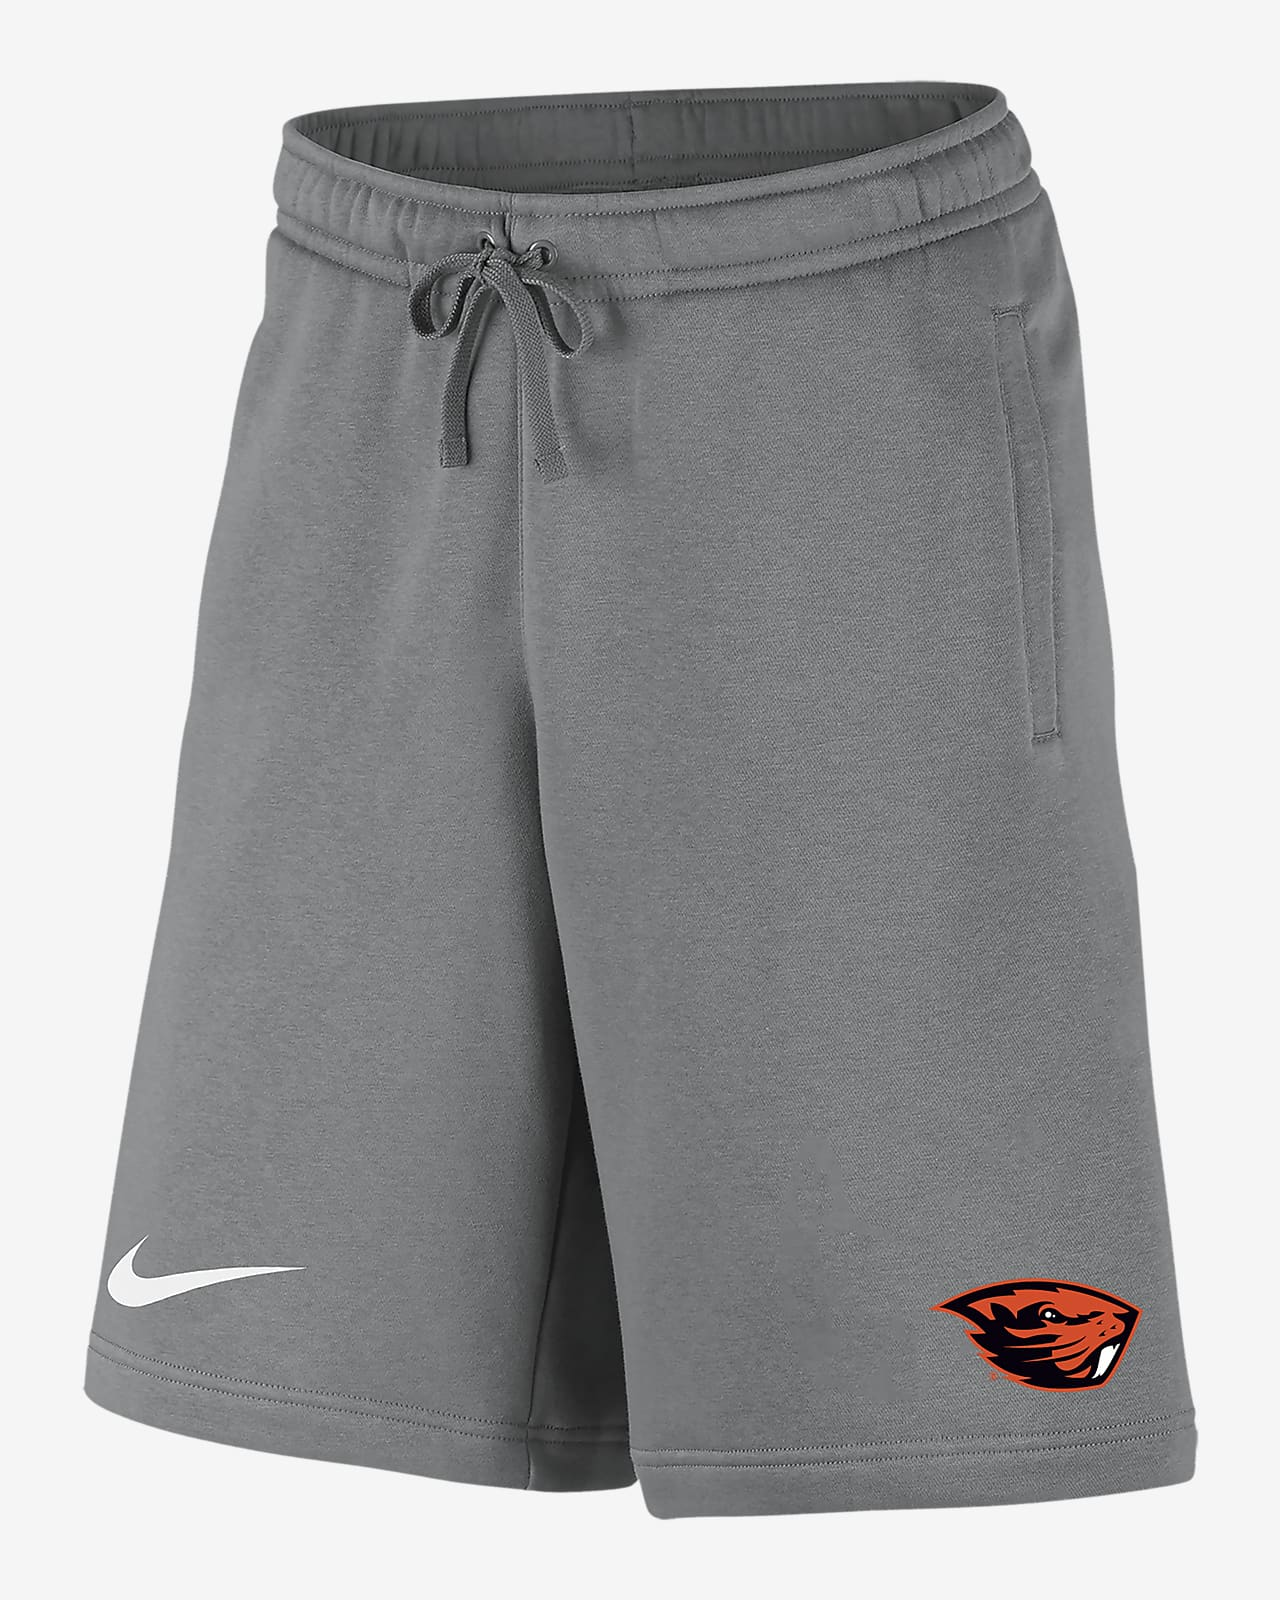 Nike College (Oregon State) Men's Fleece Shorts